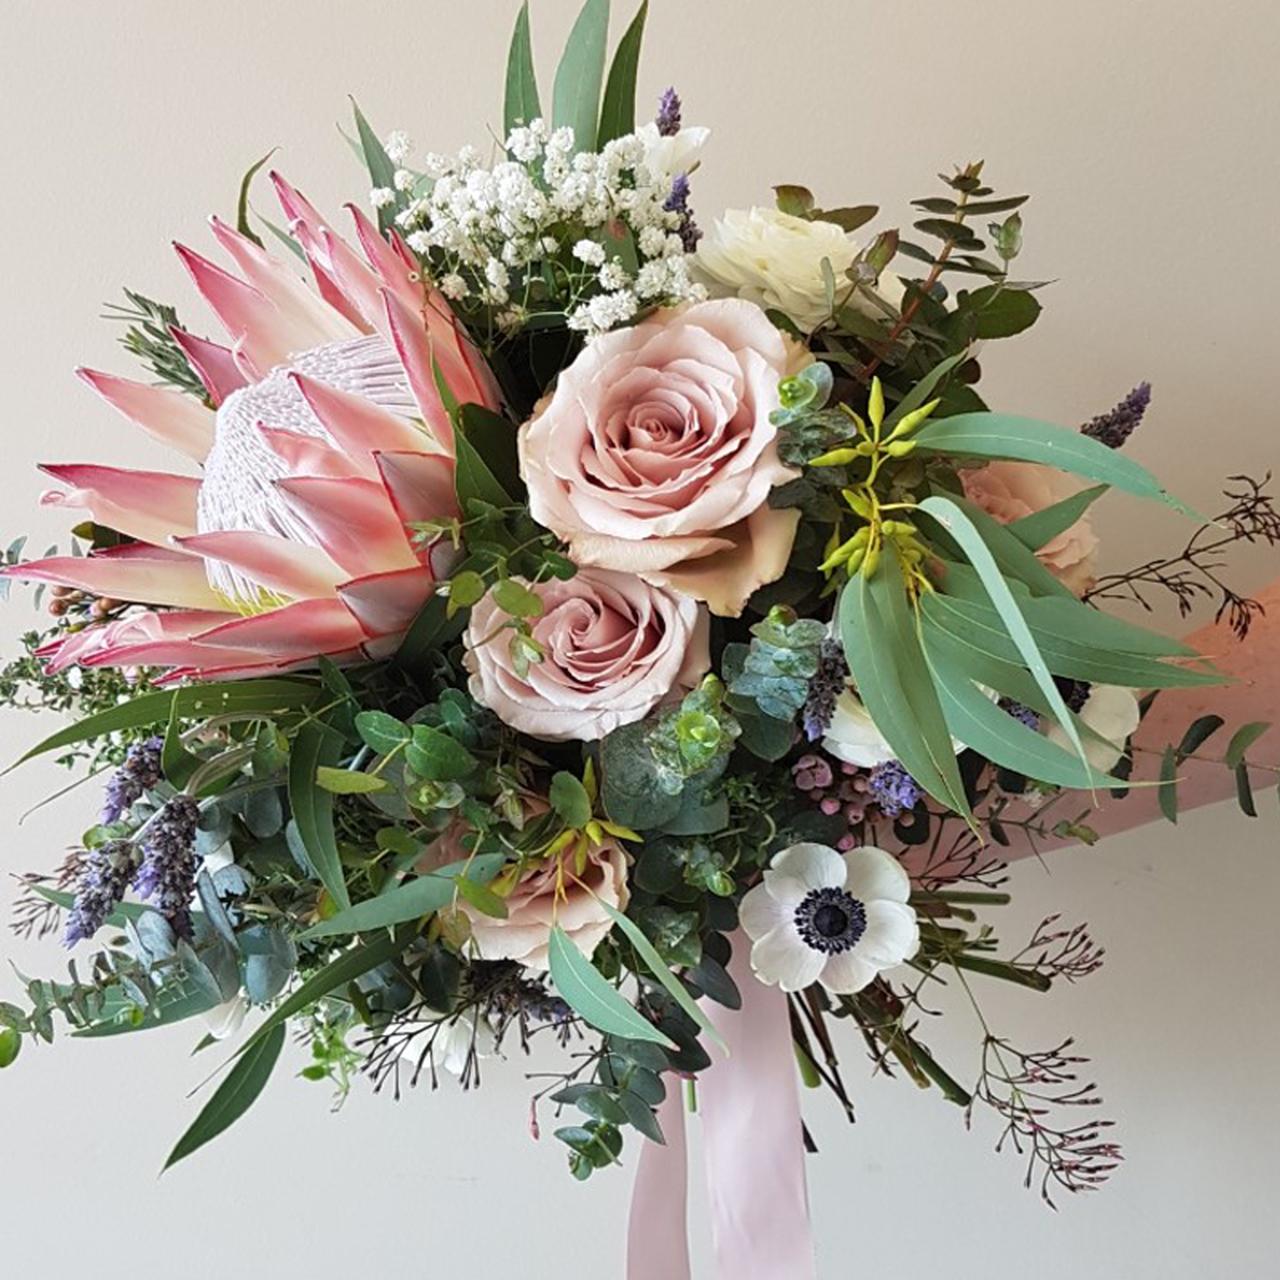 king-protea-rustic-wedding-bouquet-15895.1569315572.jpg